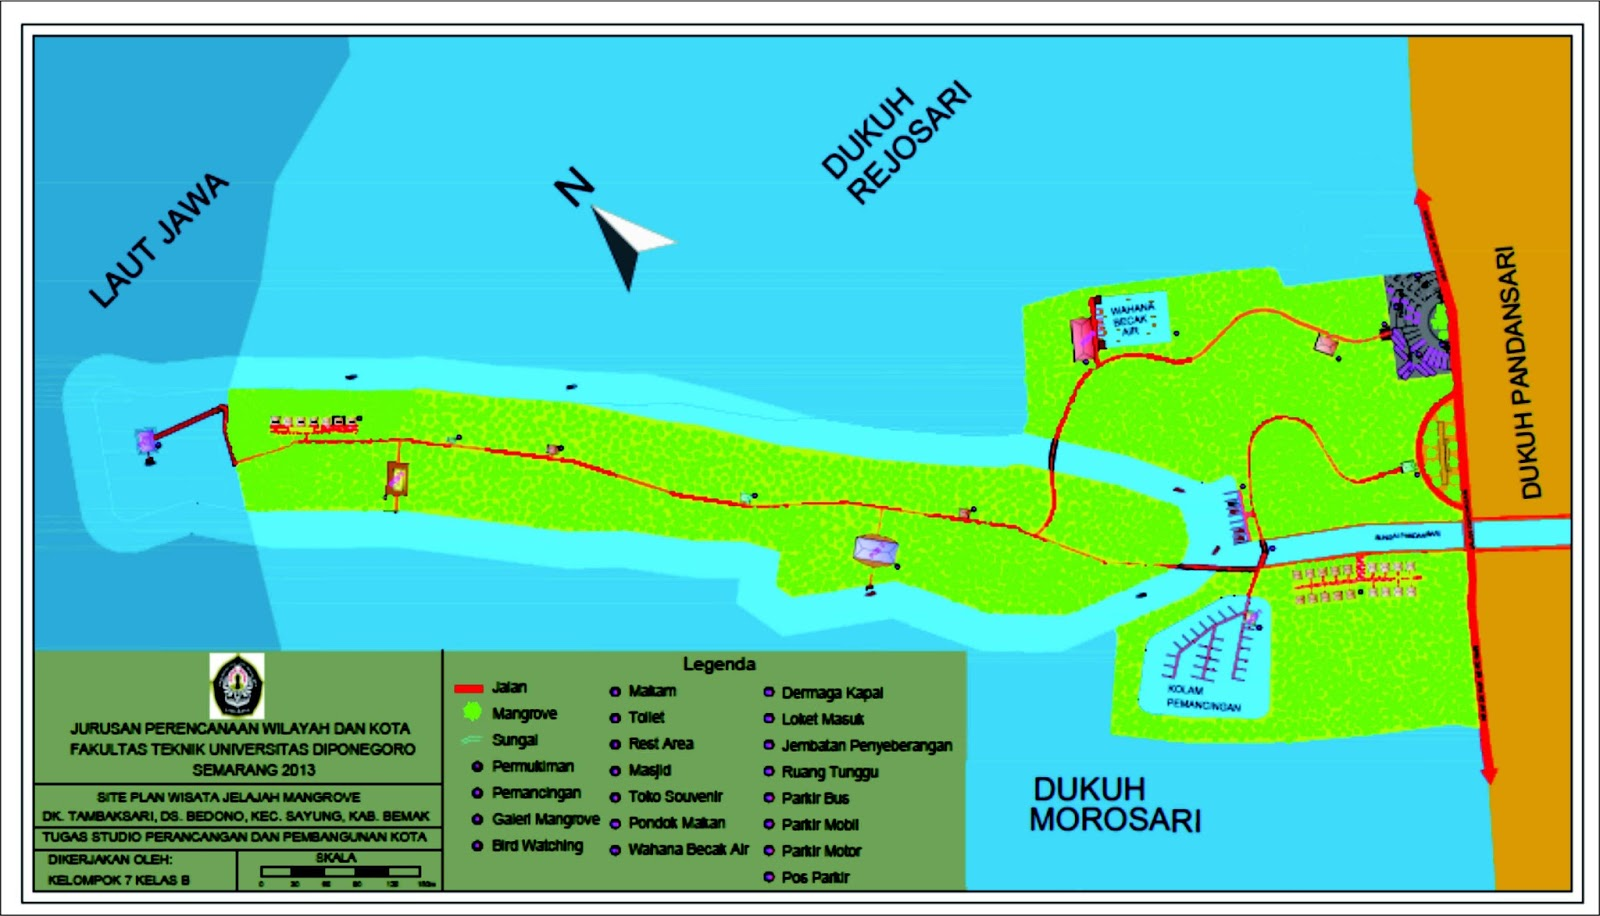 hight resolution of selain itu juga merupakan bentuk visualisai konsep wisata jelajah mangrove dalam bentuk 3d